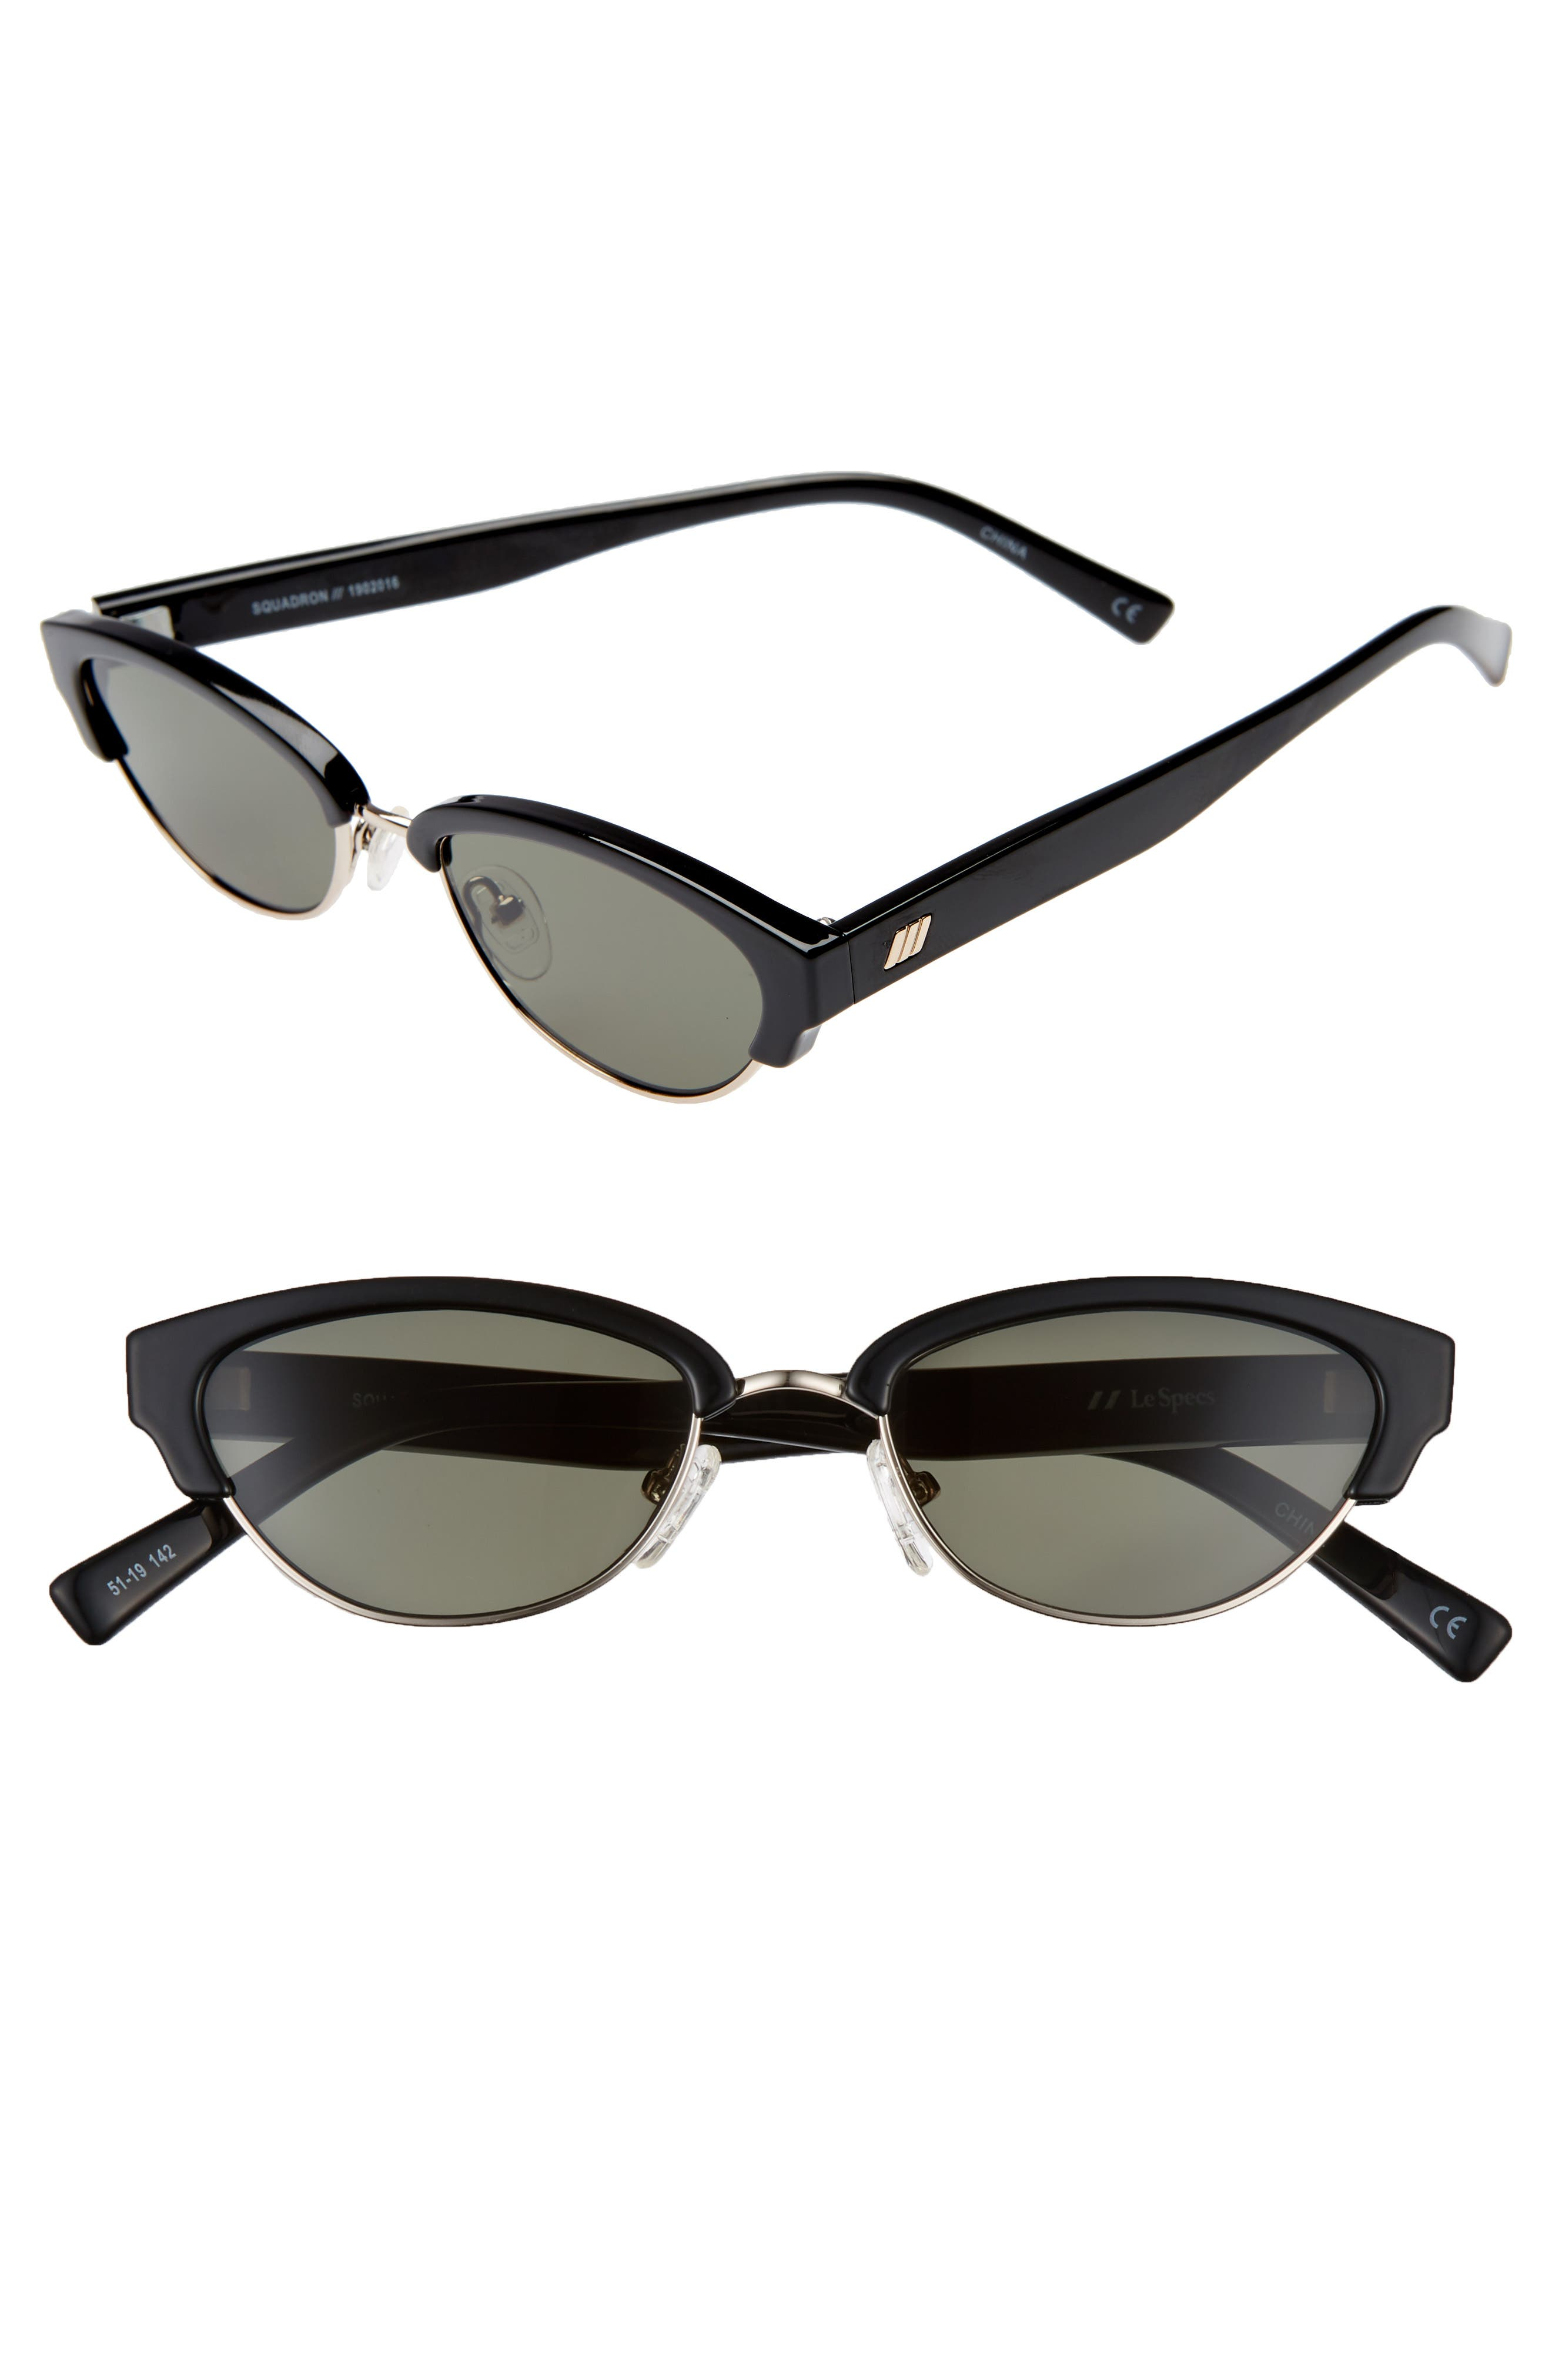 Le Specs Squadron 51Mm Brow Bar Sunglasses - Black/ Khaki